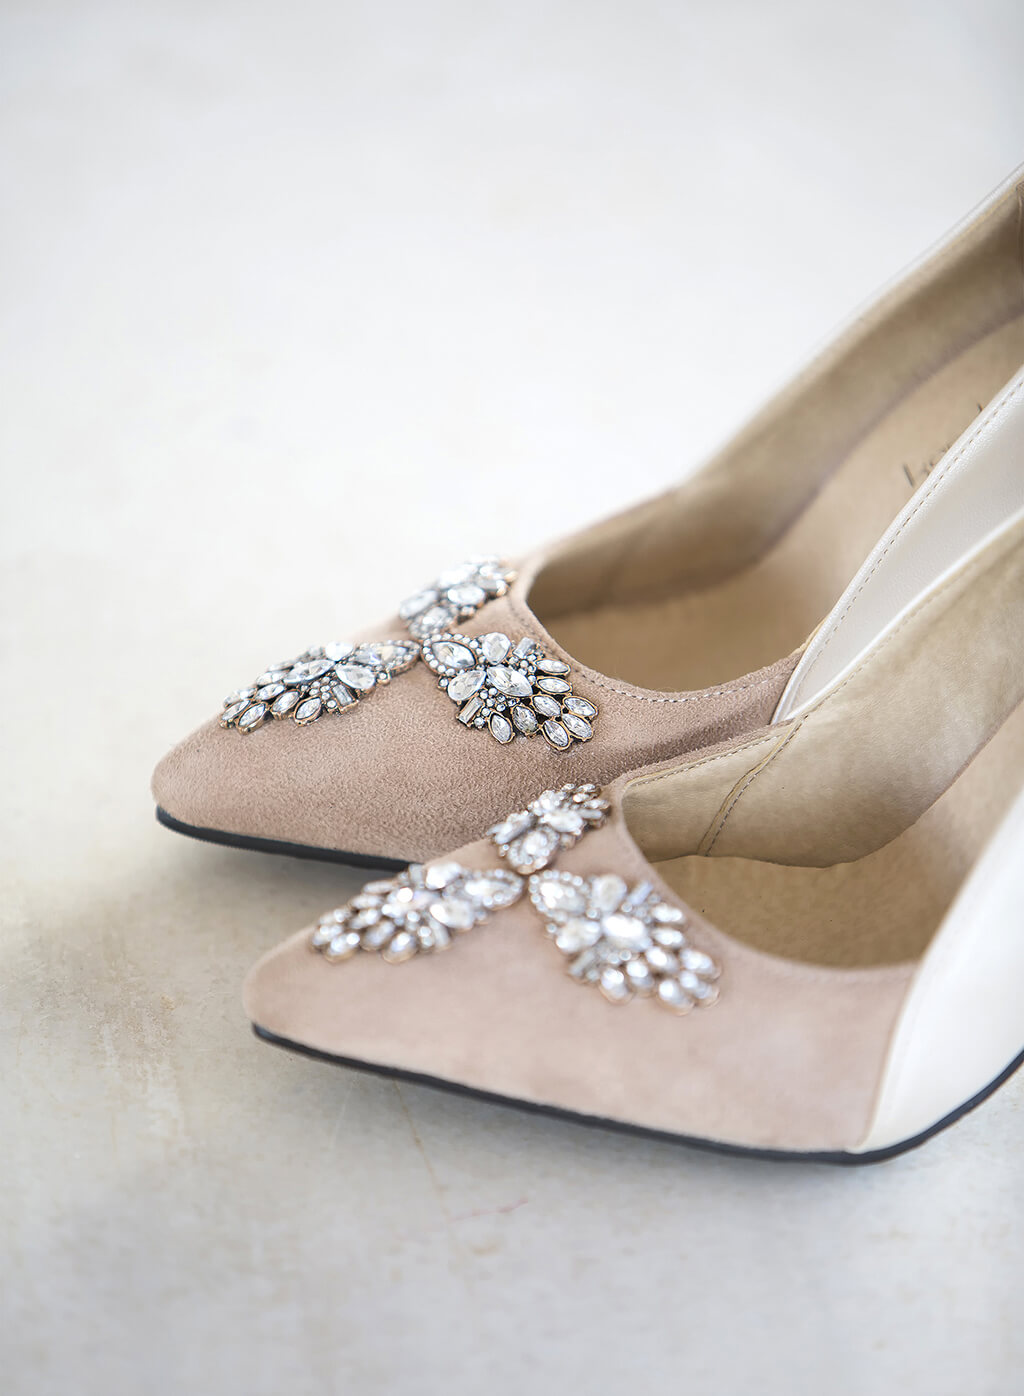 bridal freya 2017 zapato color nude con pedreria karolina fresneda